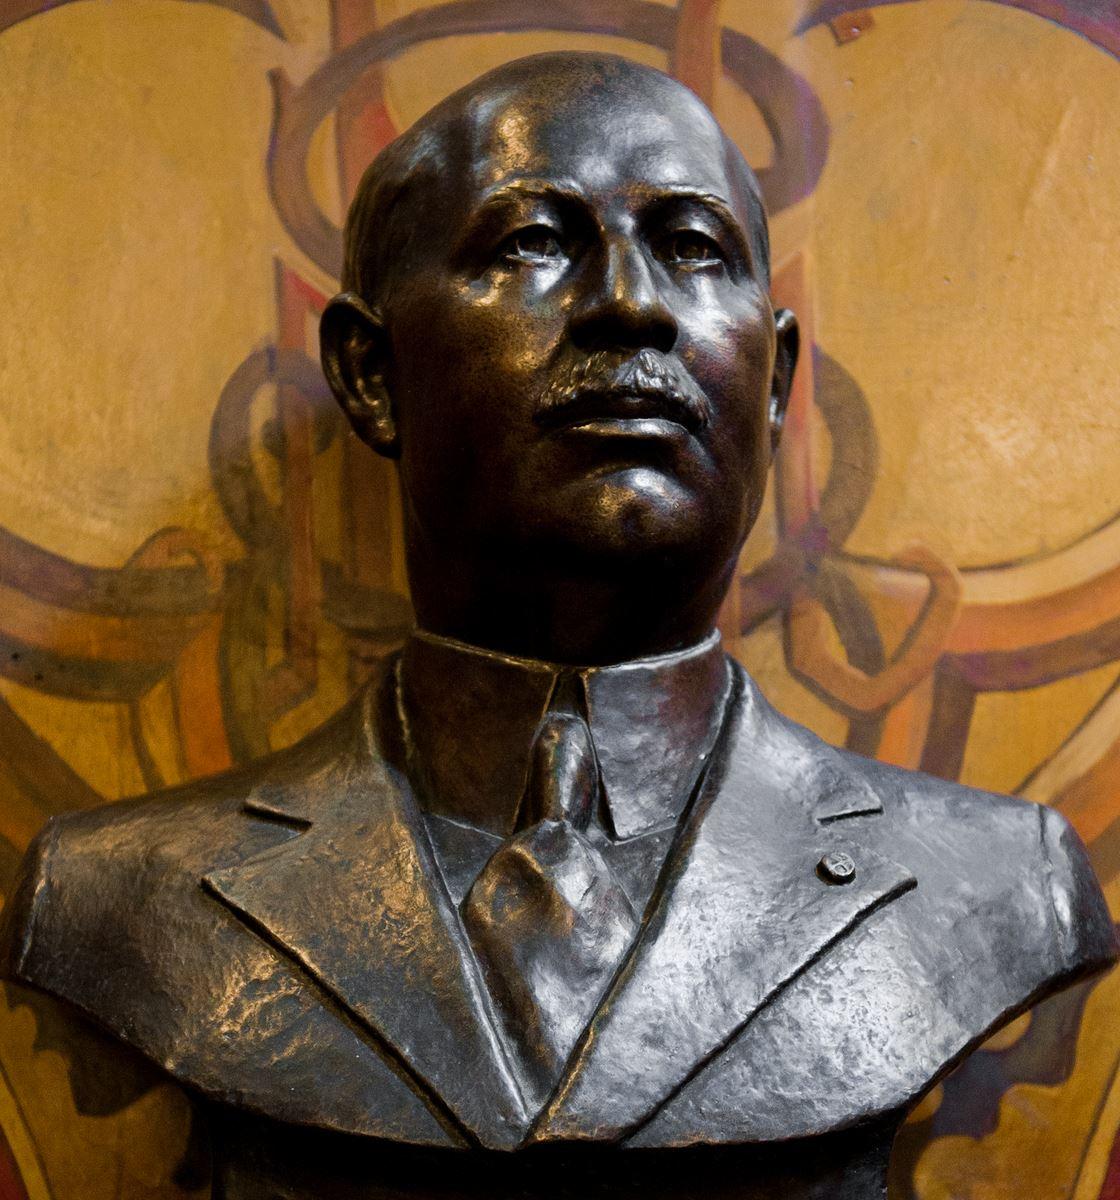 The bust of Nicolae Mircea